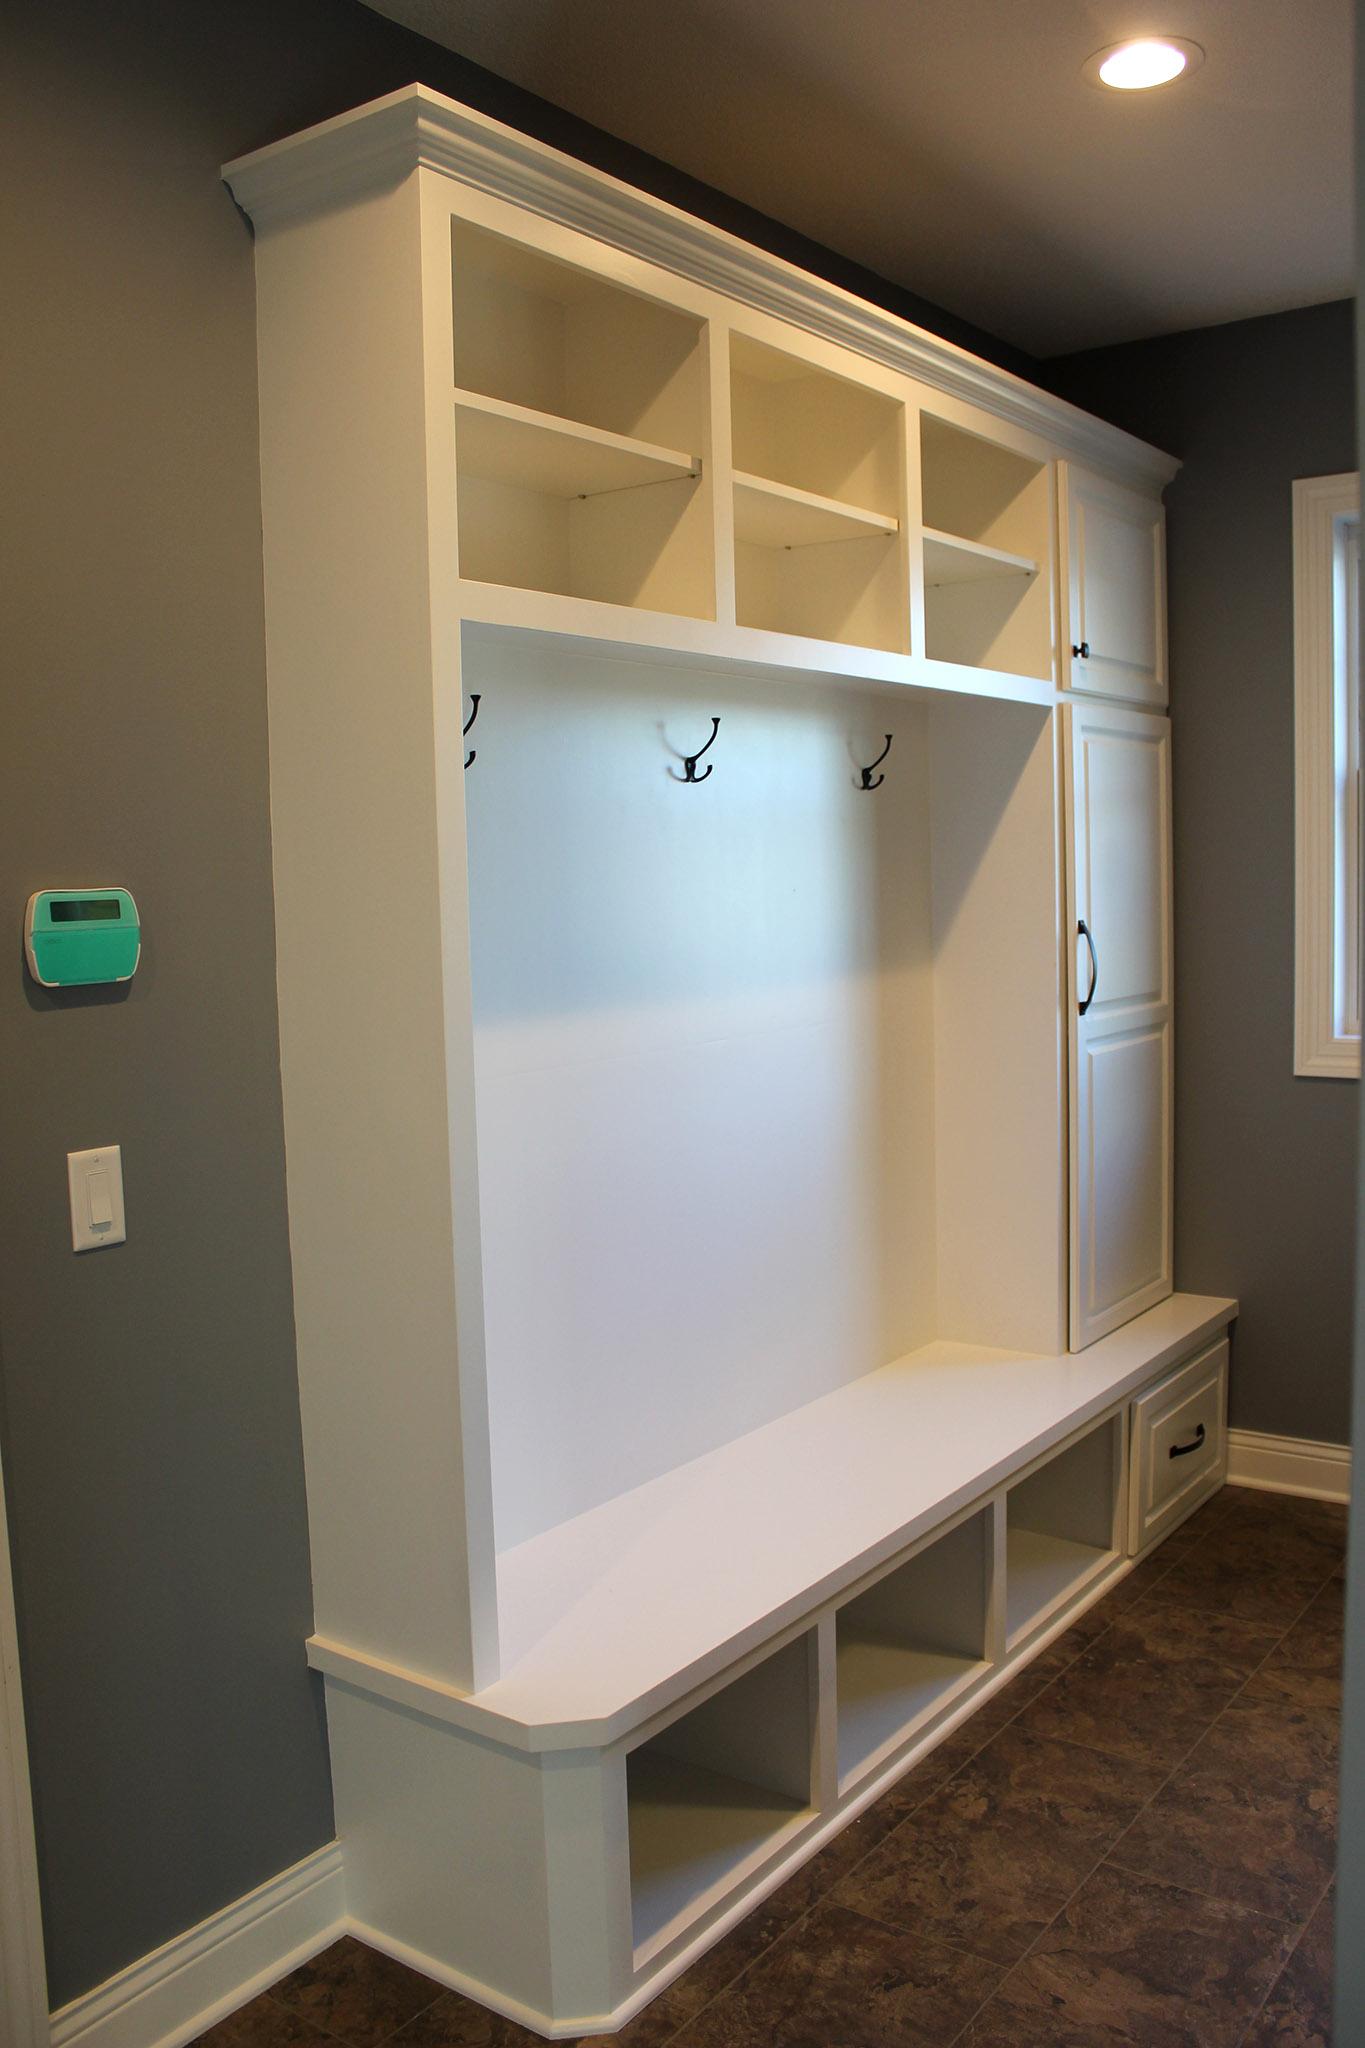 Mudroom storage lockers with coat hooks, open shoe storage below, open shelves above with ceramic tile flooring